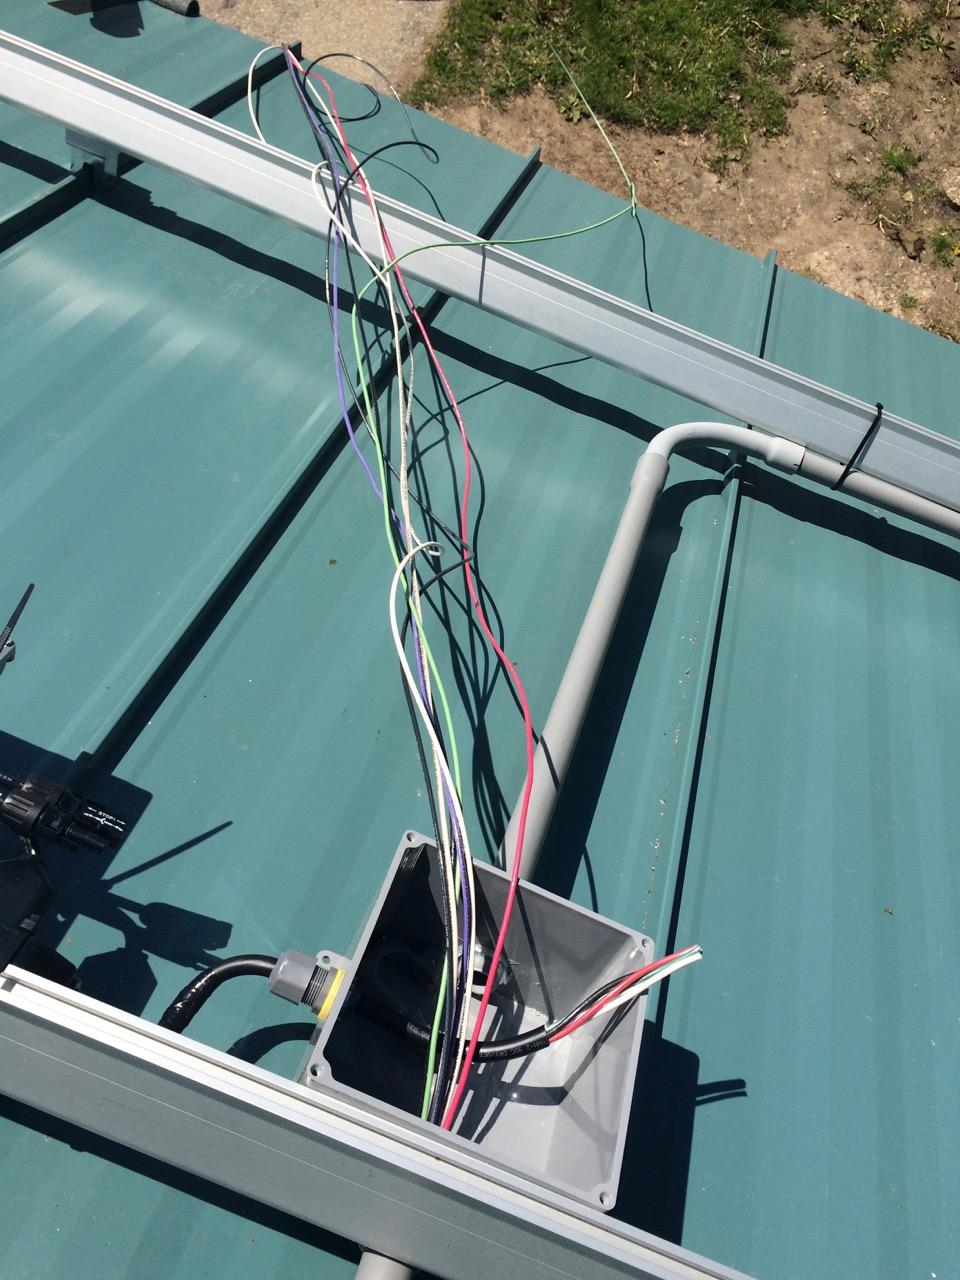 Wiring for Solar - 300MPG.org